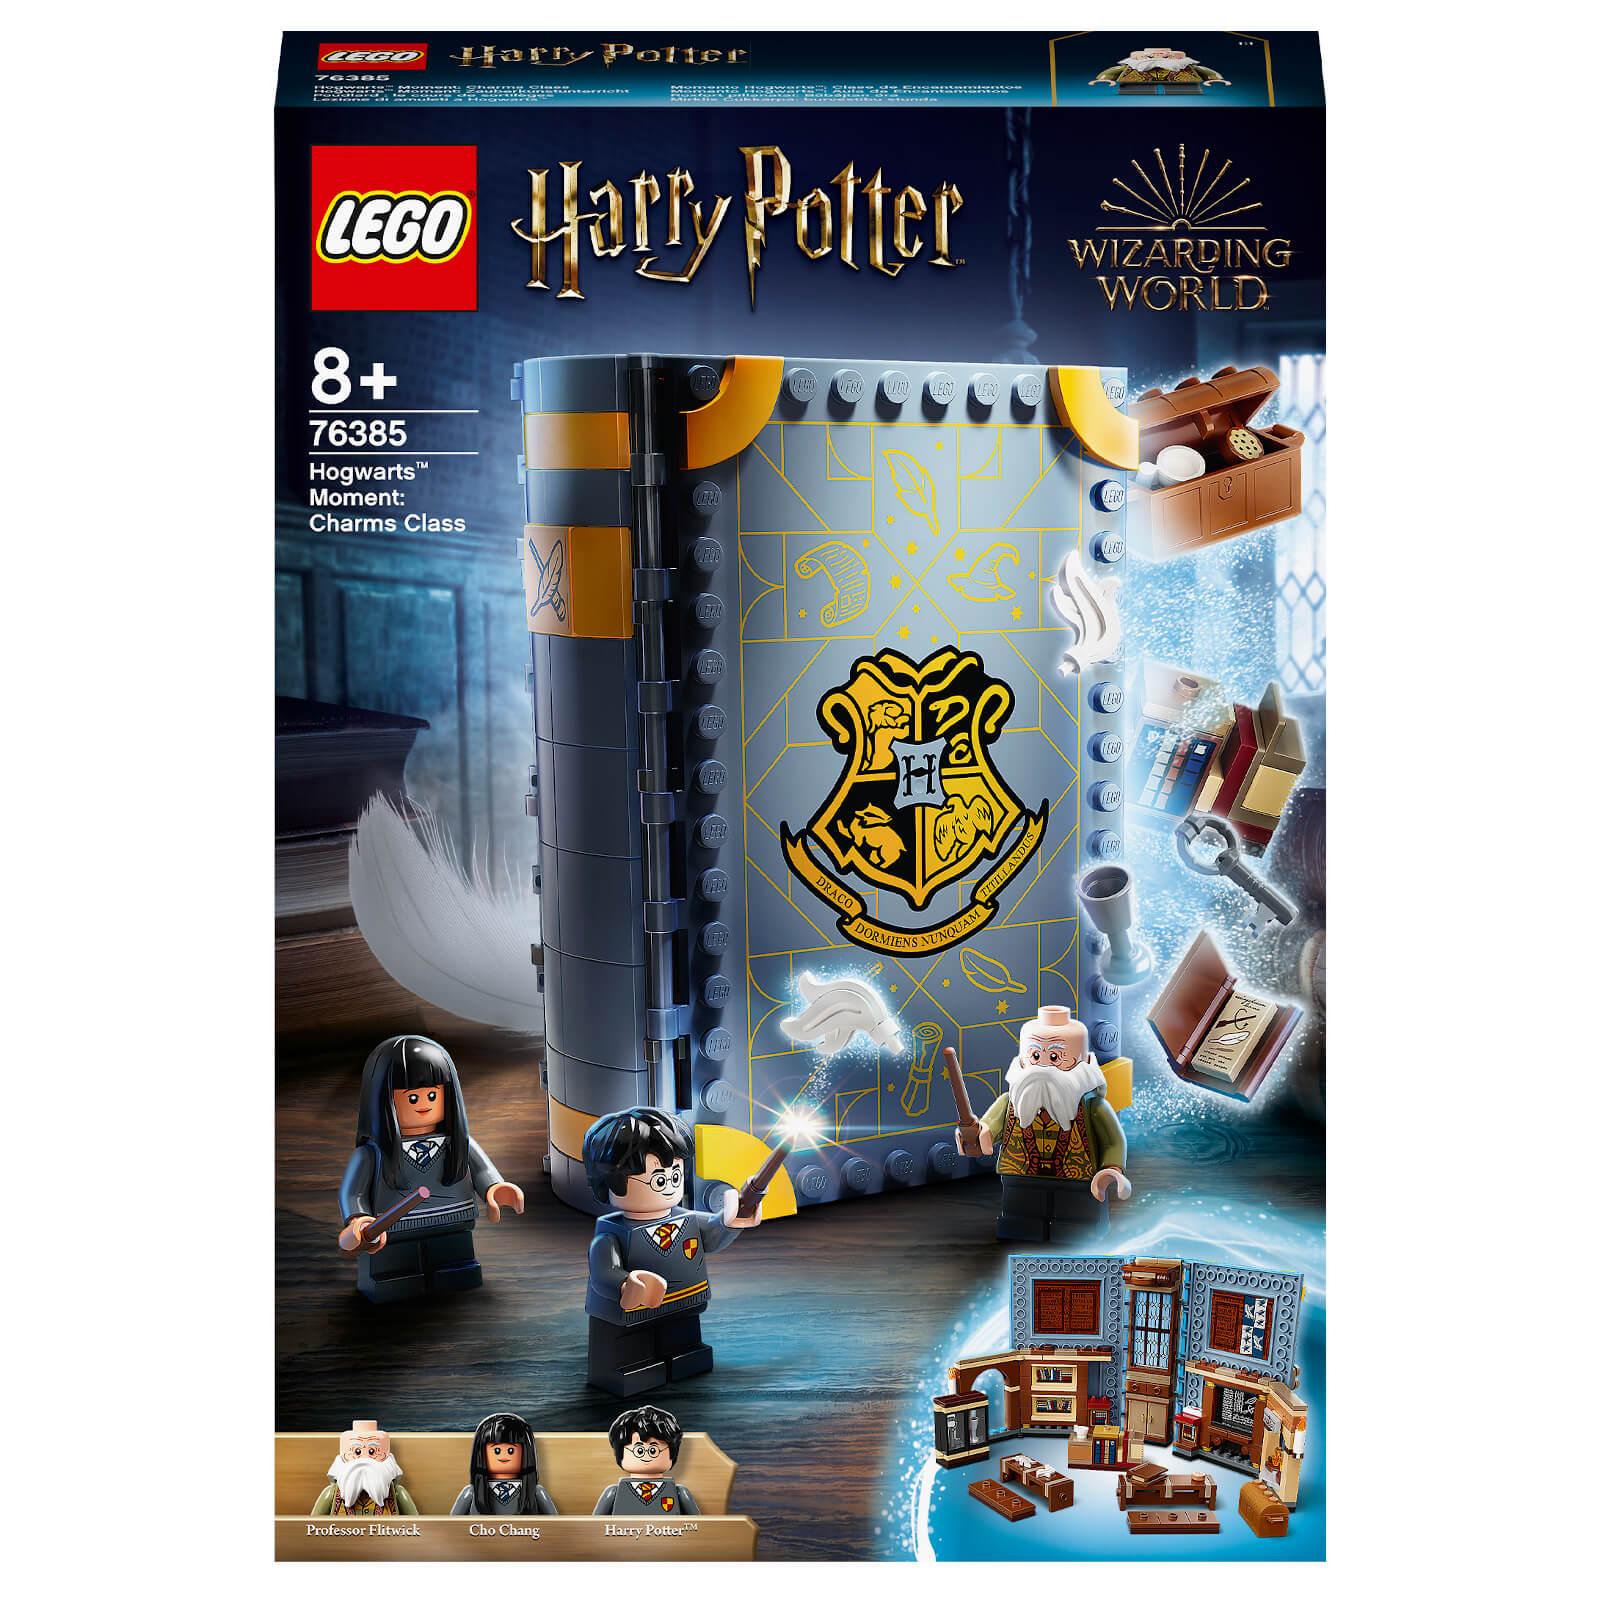 Image of LEGO Harry Potter: Hogwarts Charms Class Set (76385)